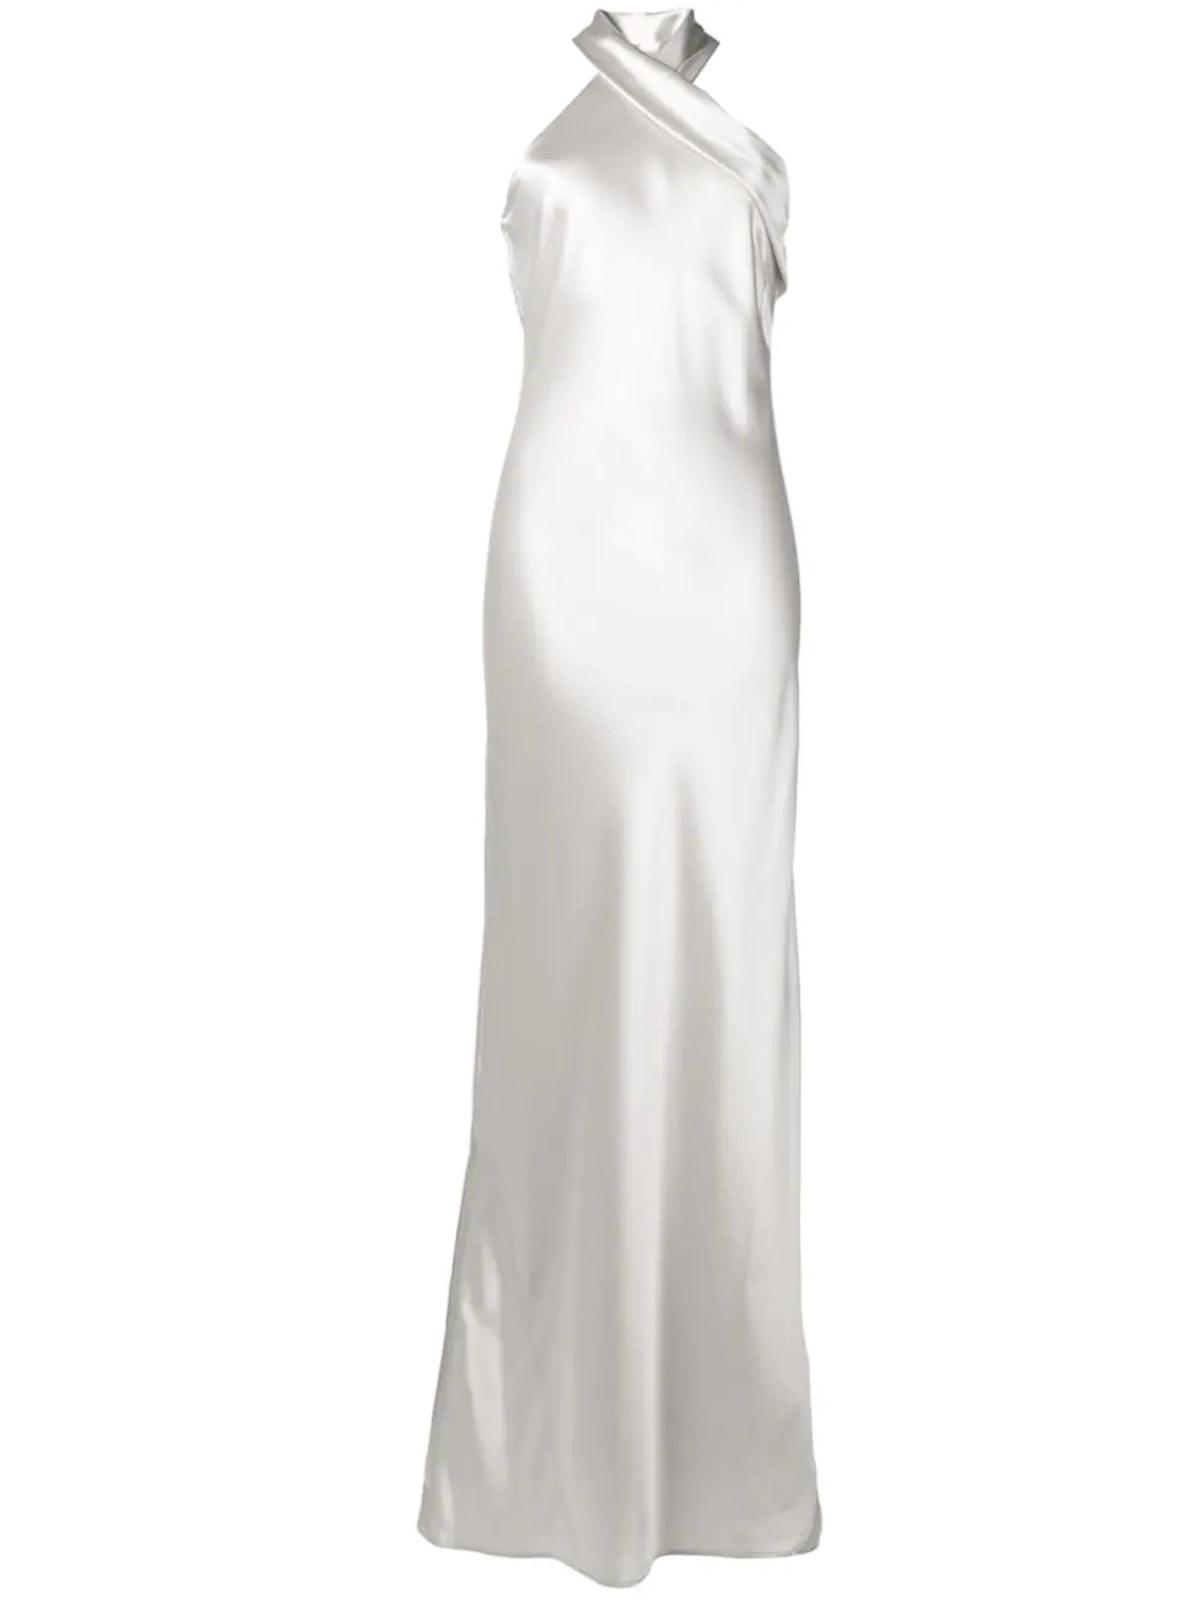 Pandora Halter Neck Dress from Galvan London.